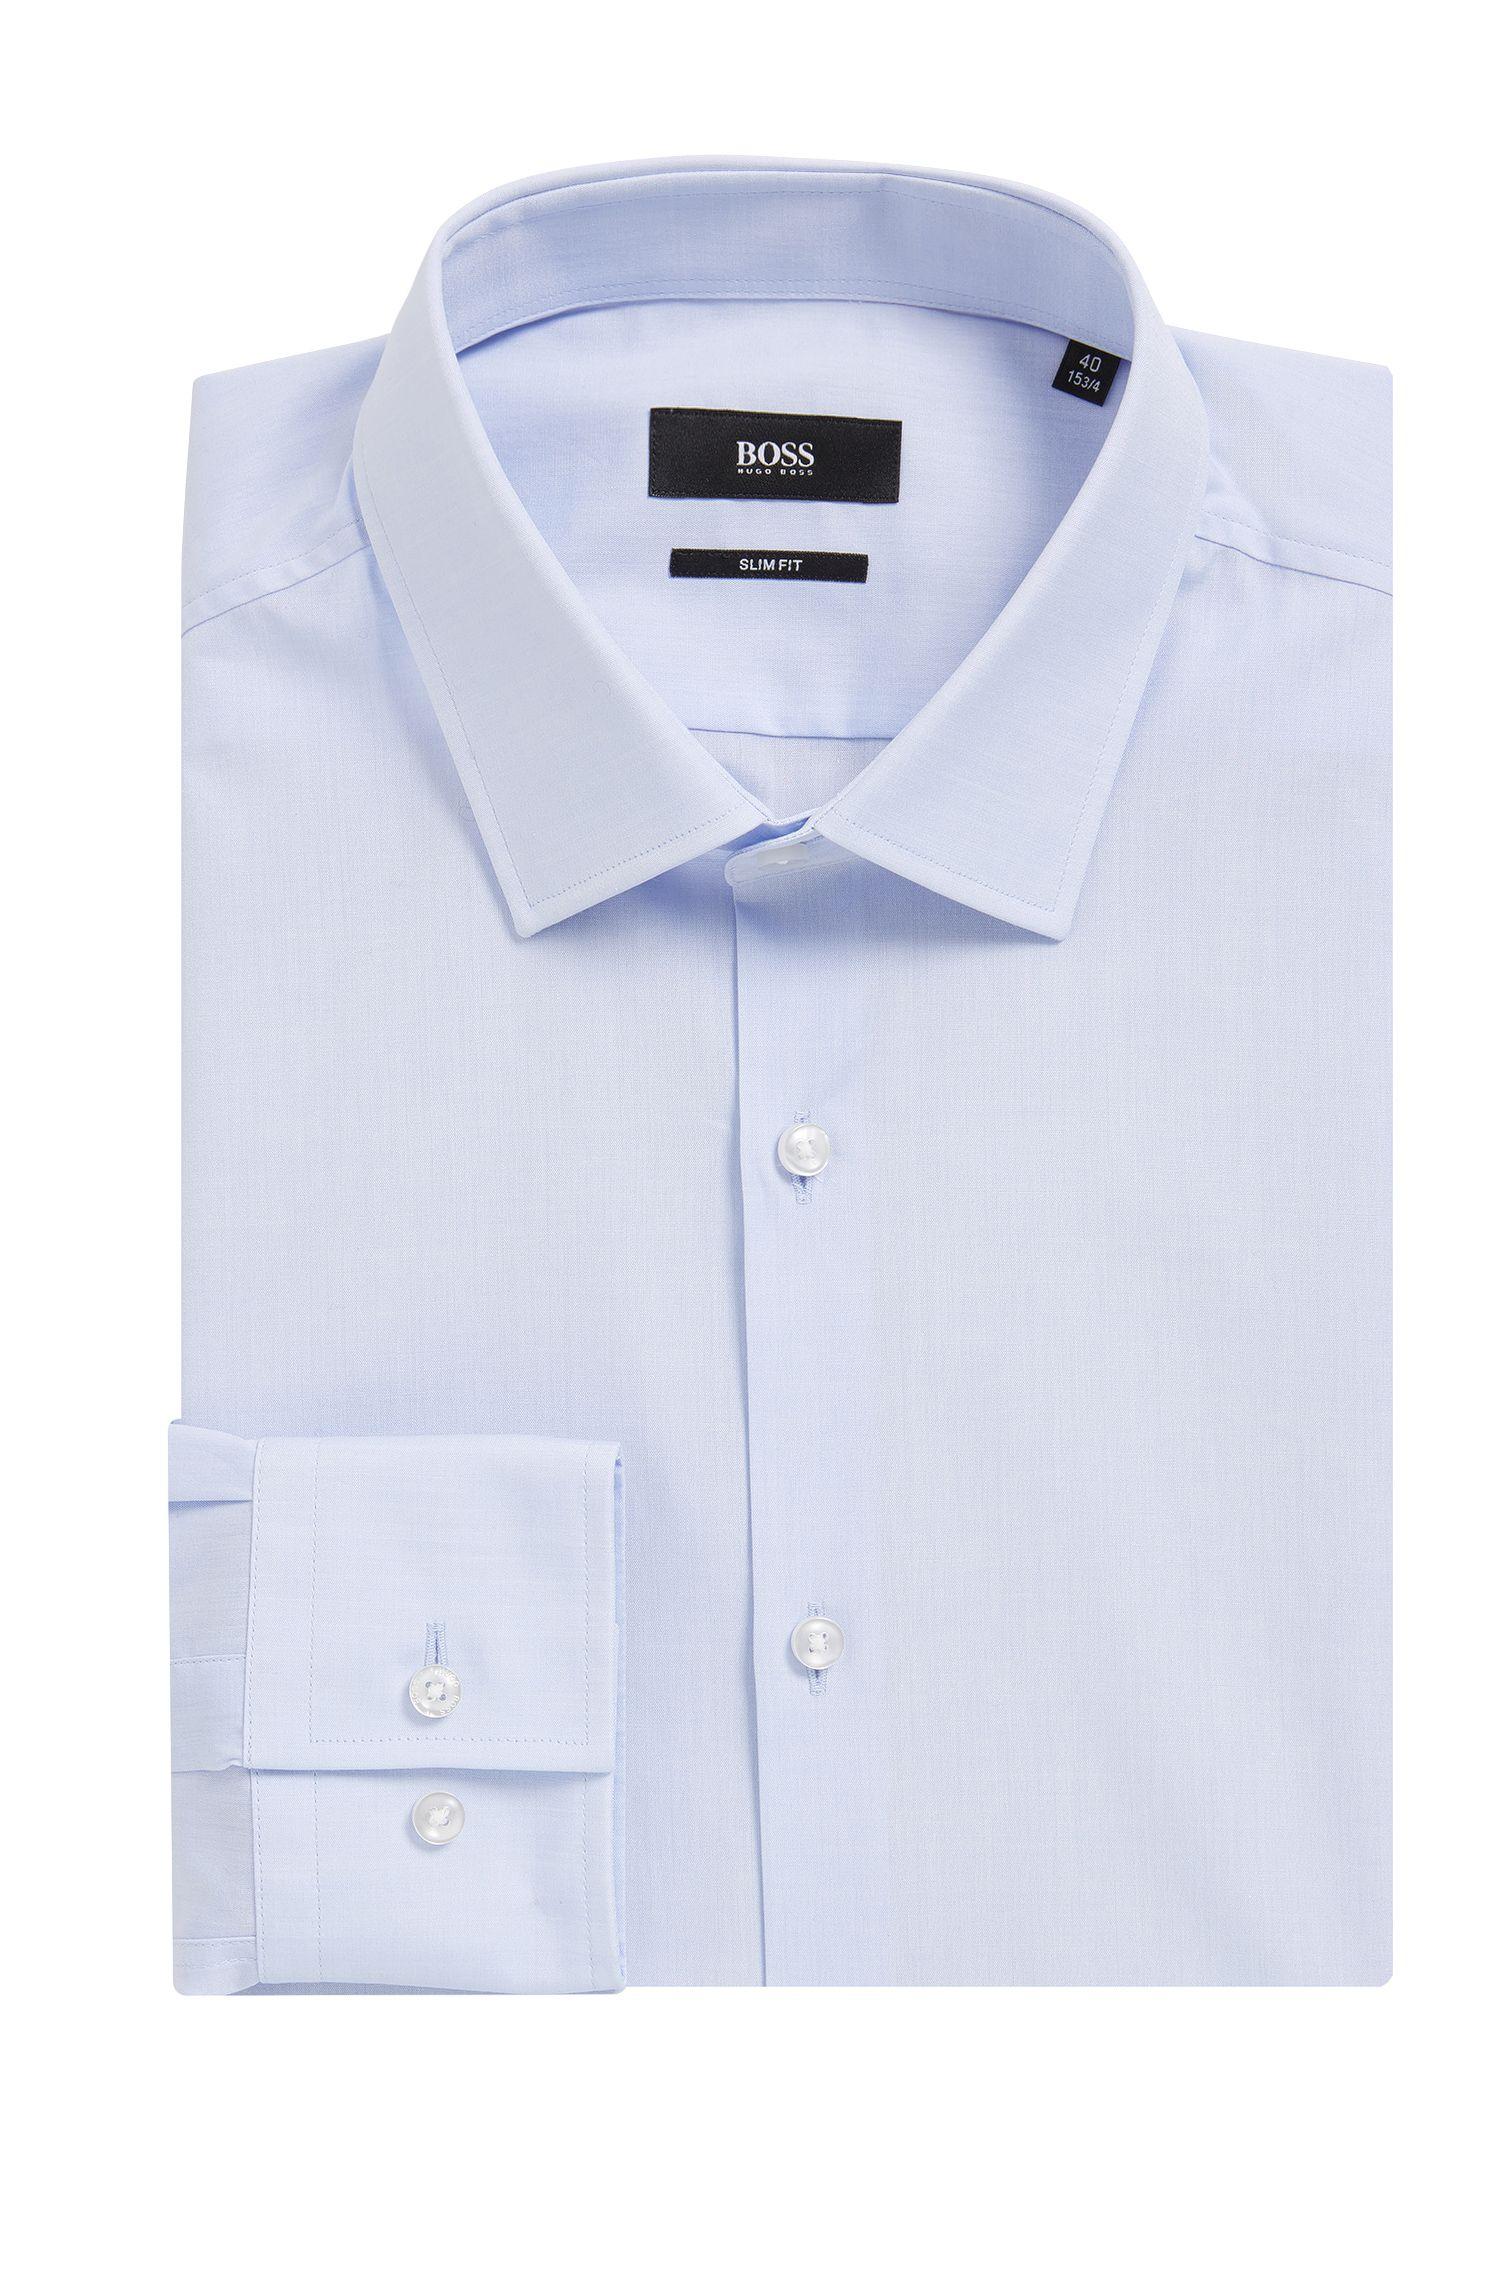 Two-Ply Cotton Dress Shirt, Slim Fit | Jenno